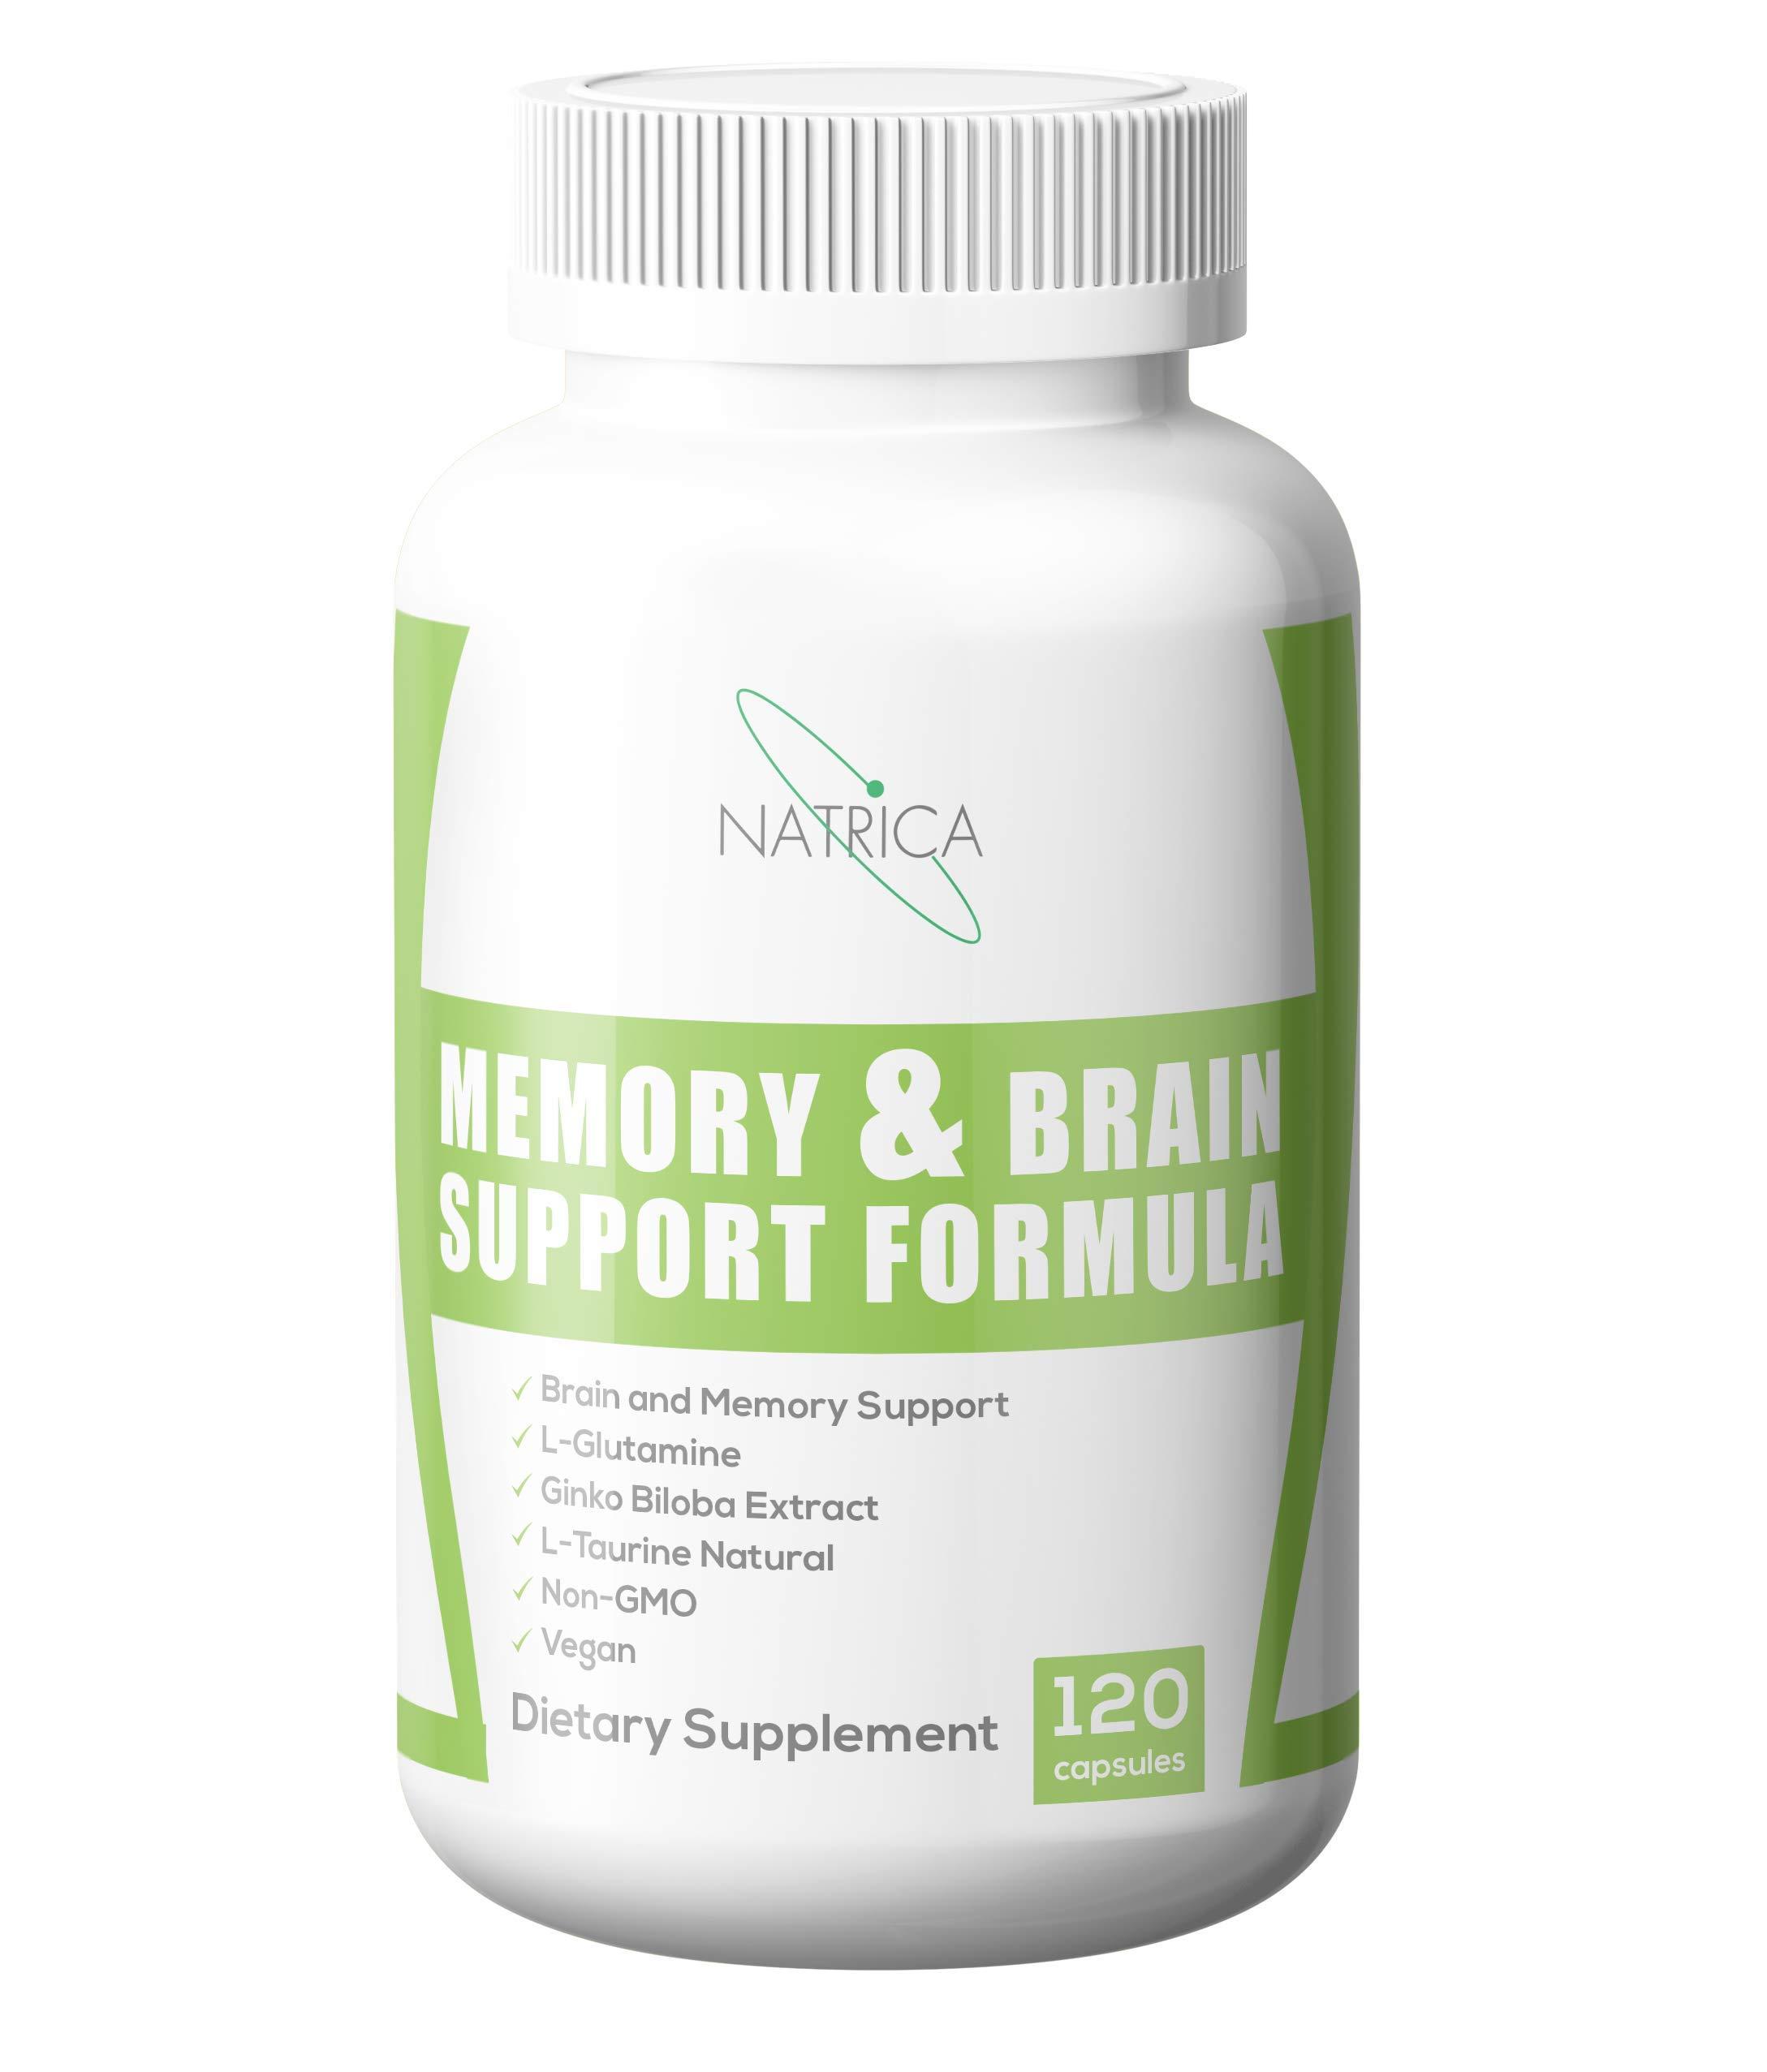 Natrica Memory & Brain Support Formula, 120Count